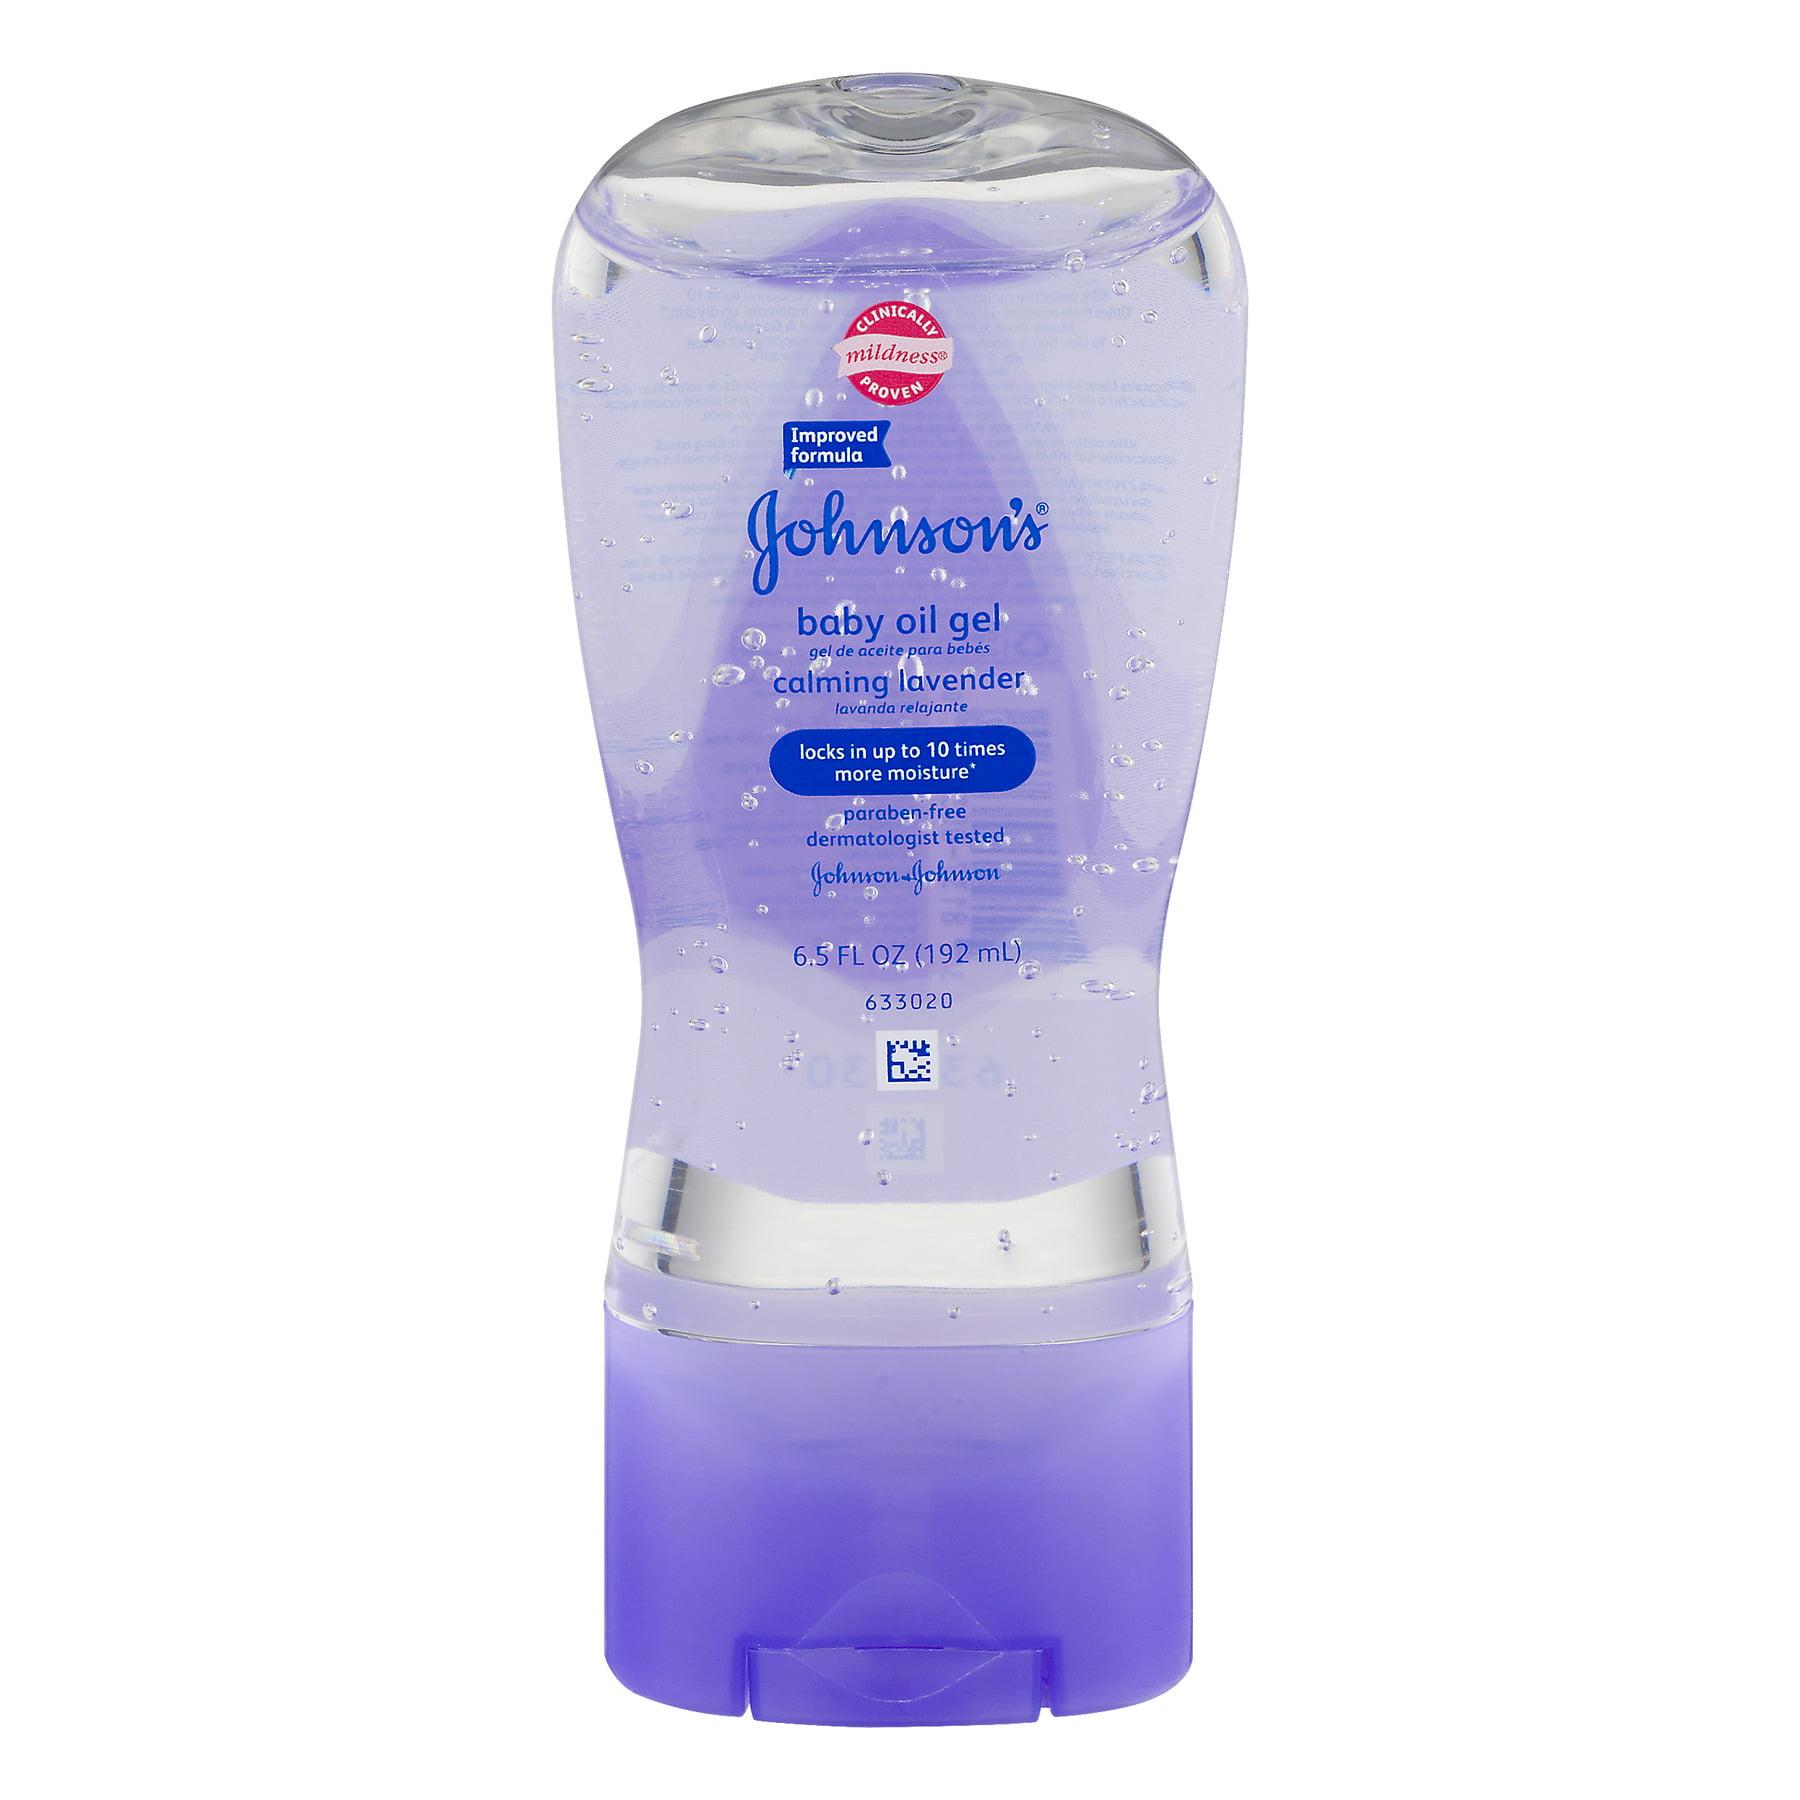 Johnson's Baby Oil Gel Calming Lavender, 6.5 FL OZ